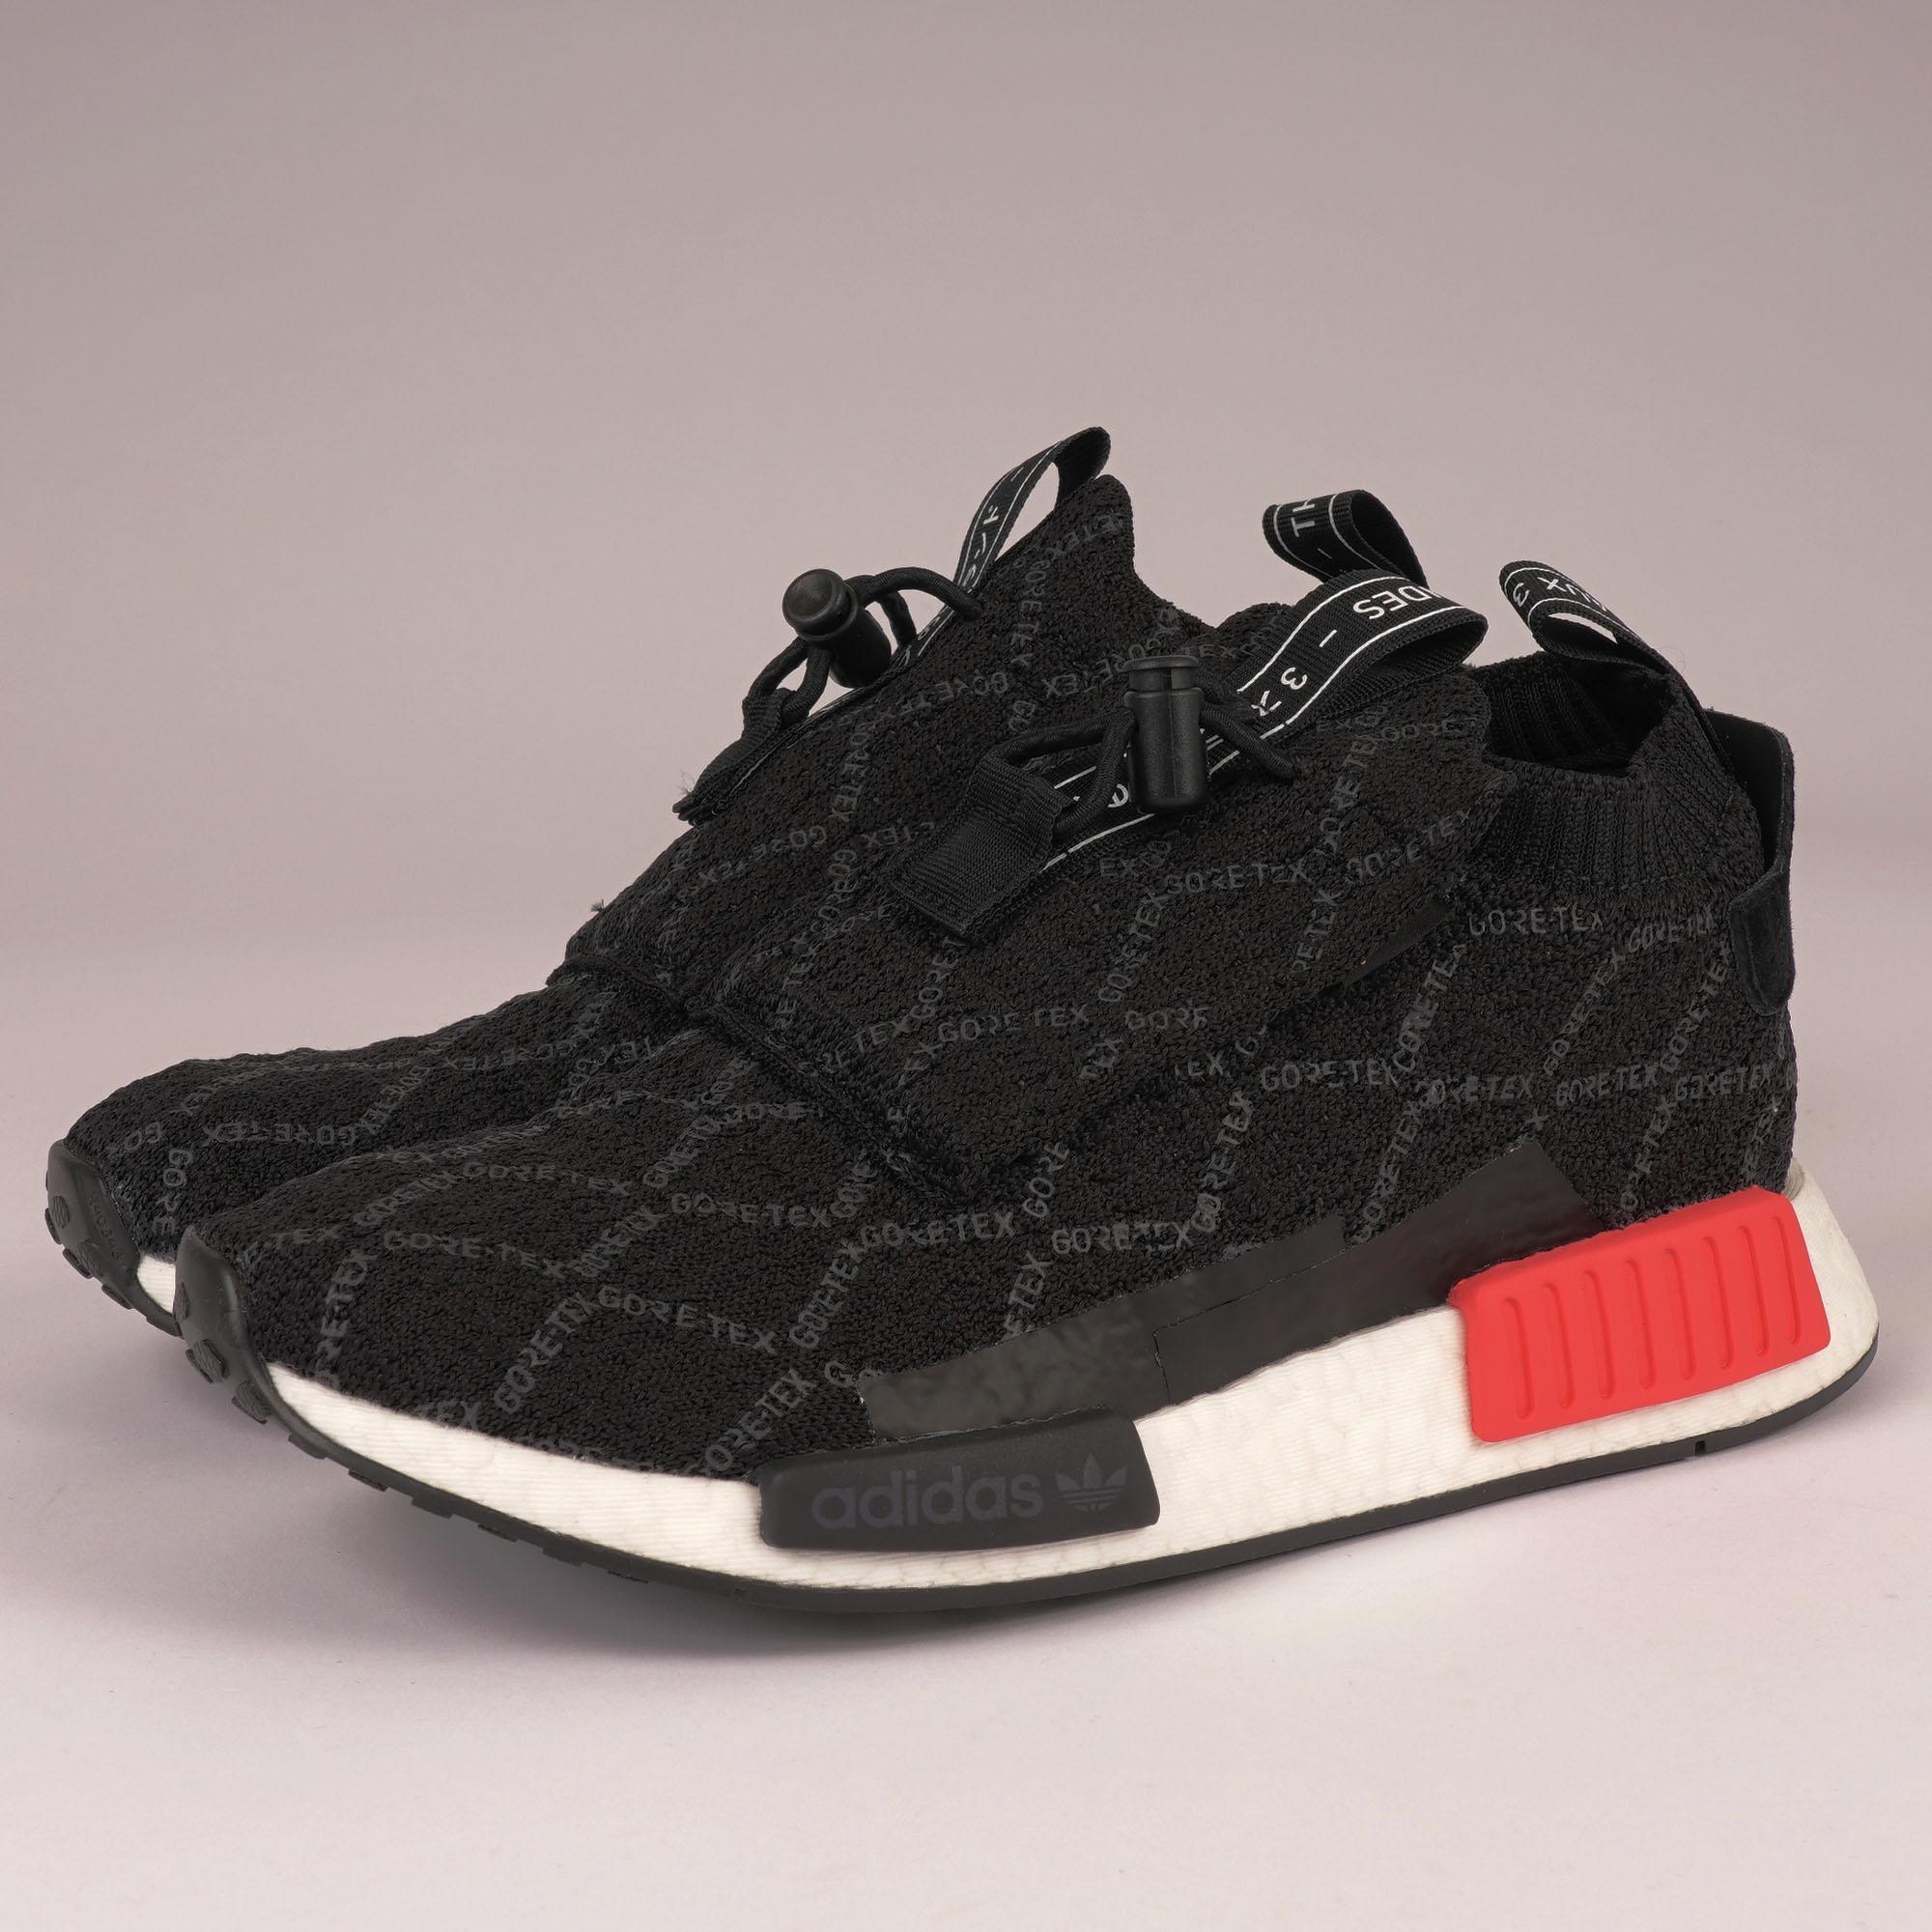 183253666e0be Lyst - adidas Originals Nmd ts1 Primeknit Gtx in Black for Men